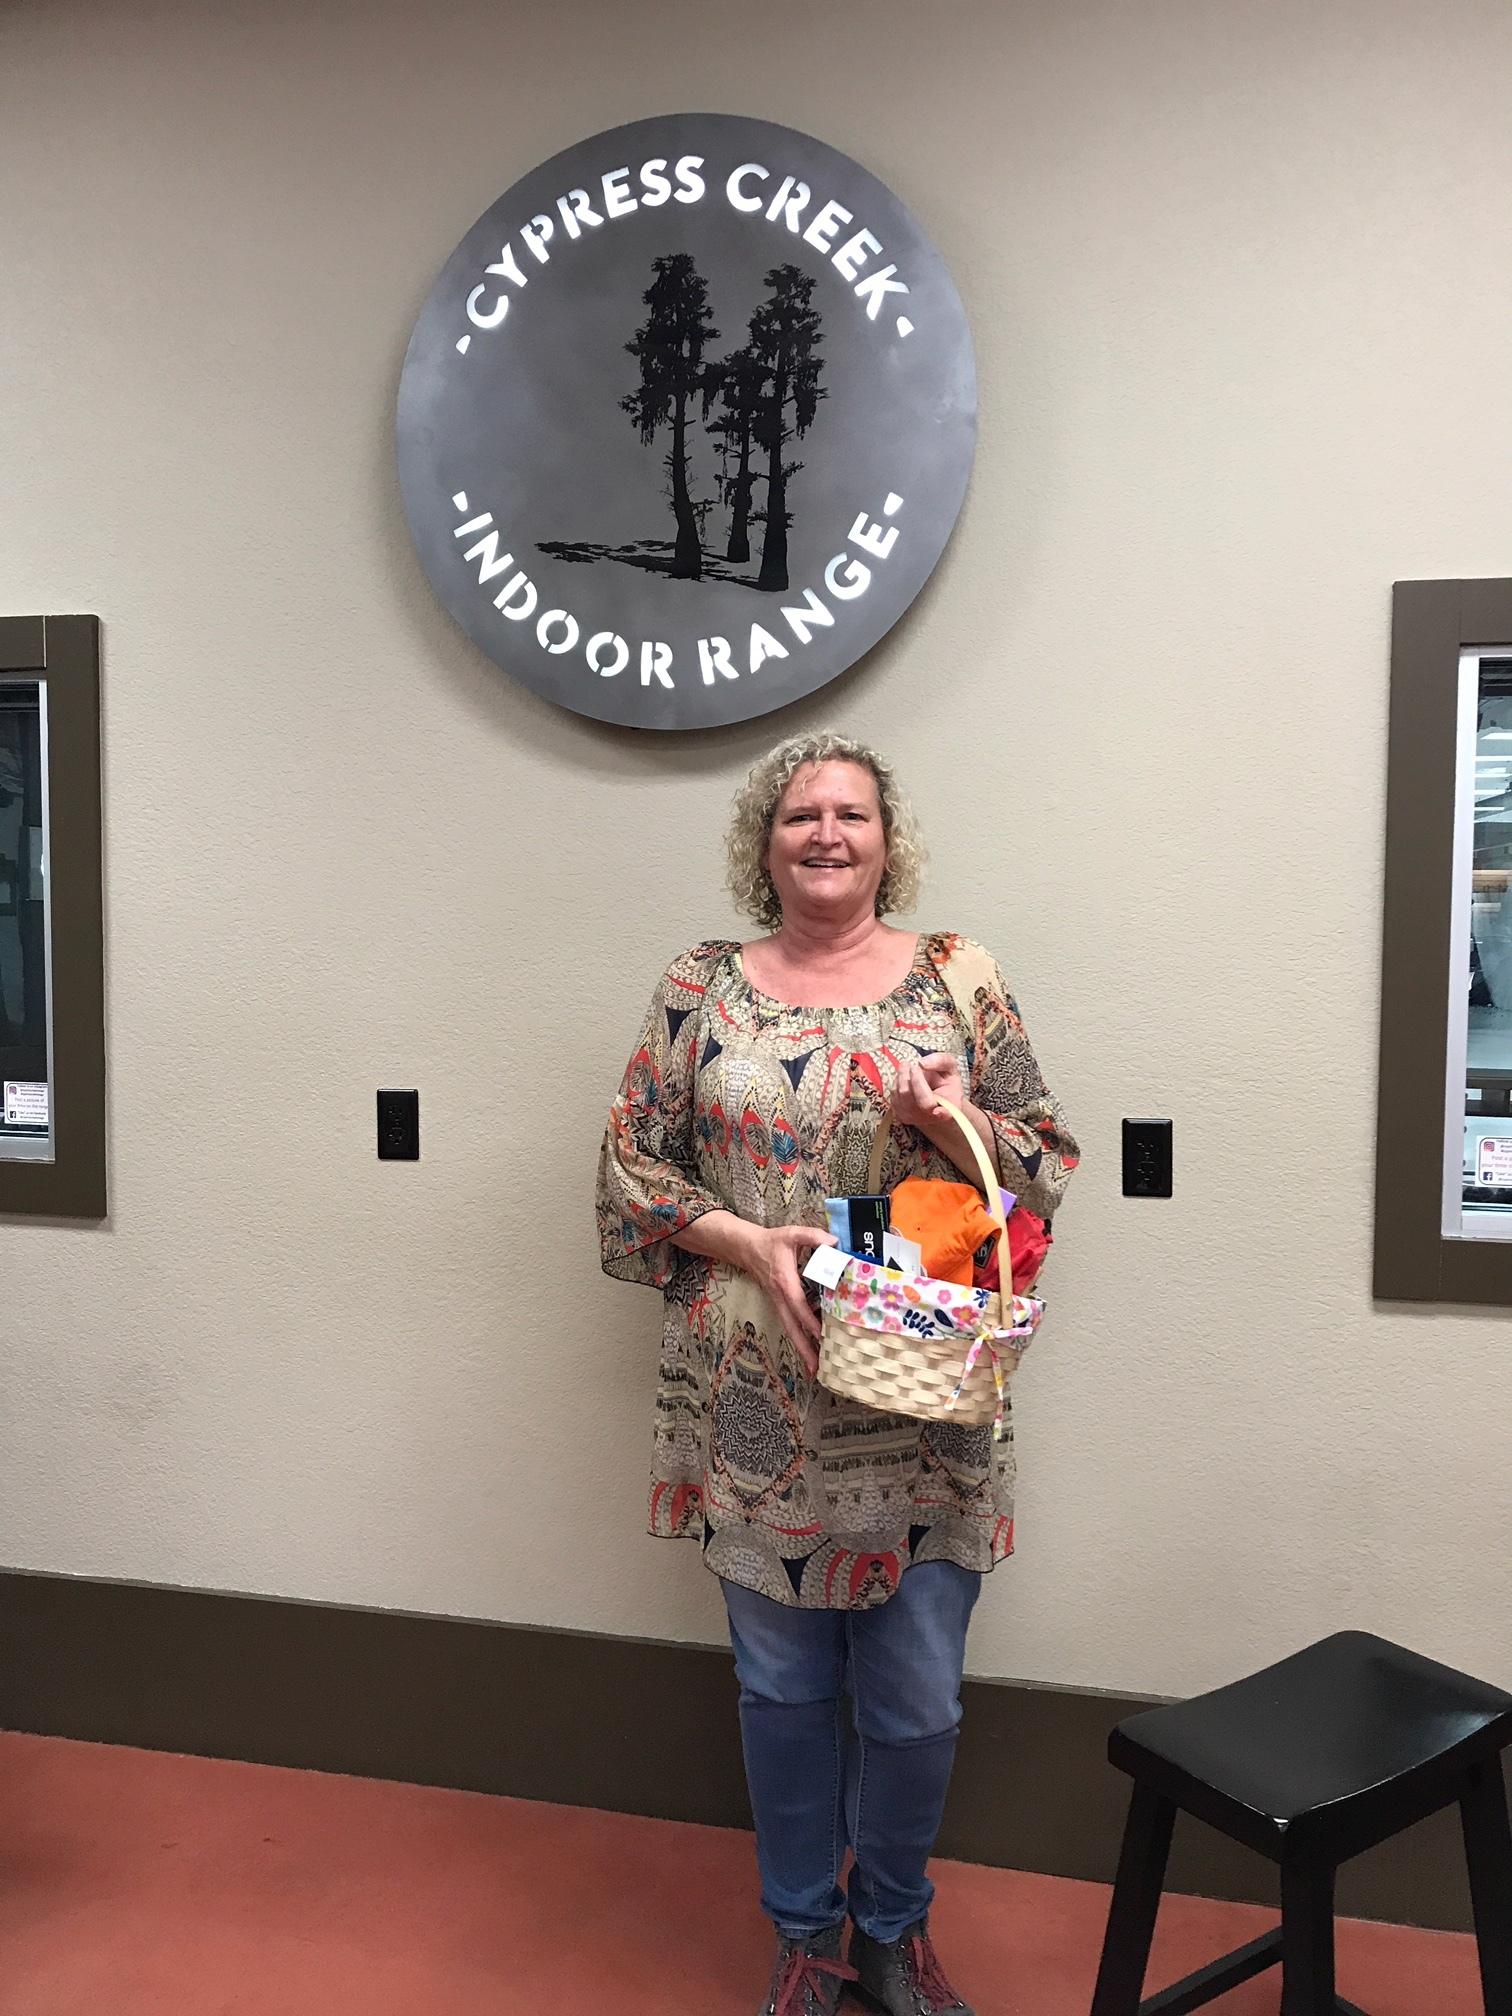 Congratulations to Dawn Swann. She found Egg #4.